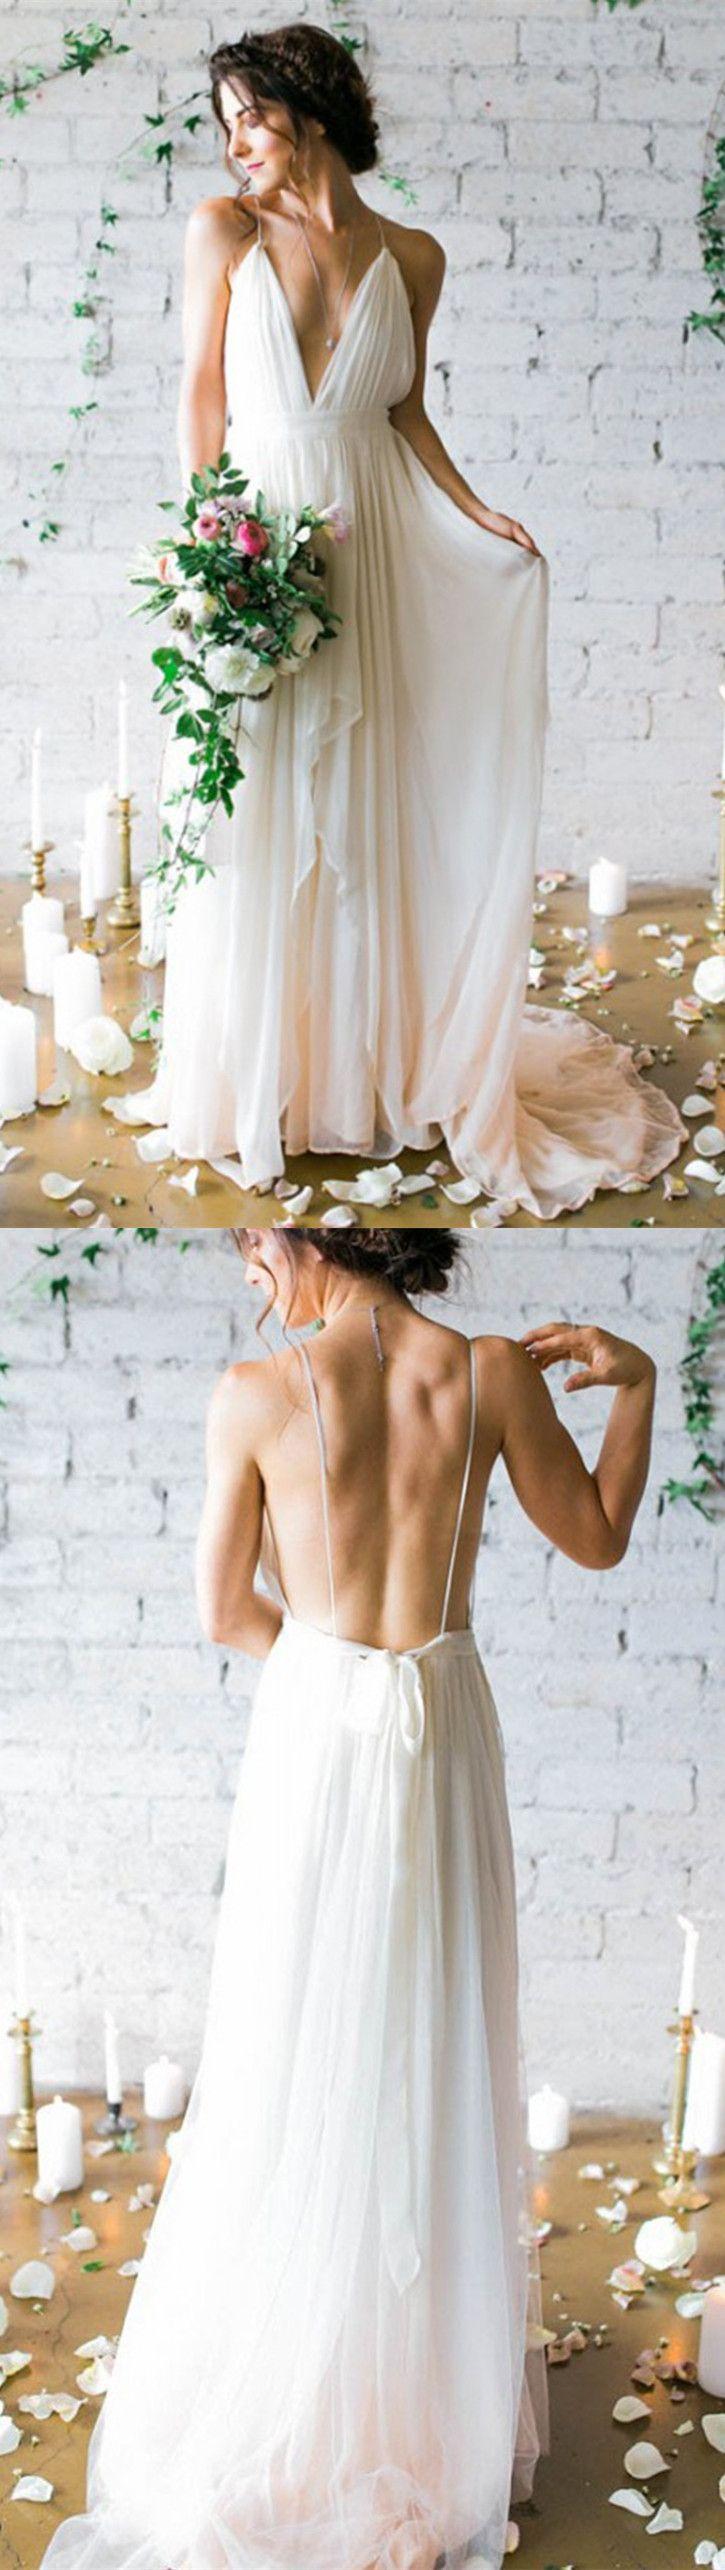 Best 20 unusual wedding dresses ideas on pinterest for Wedding dress shops reading